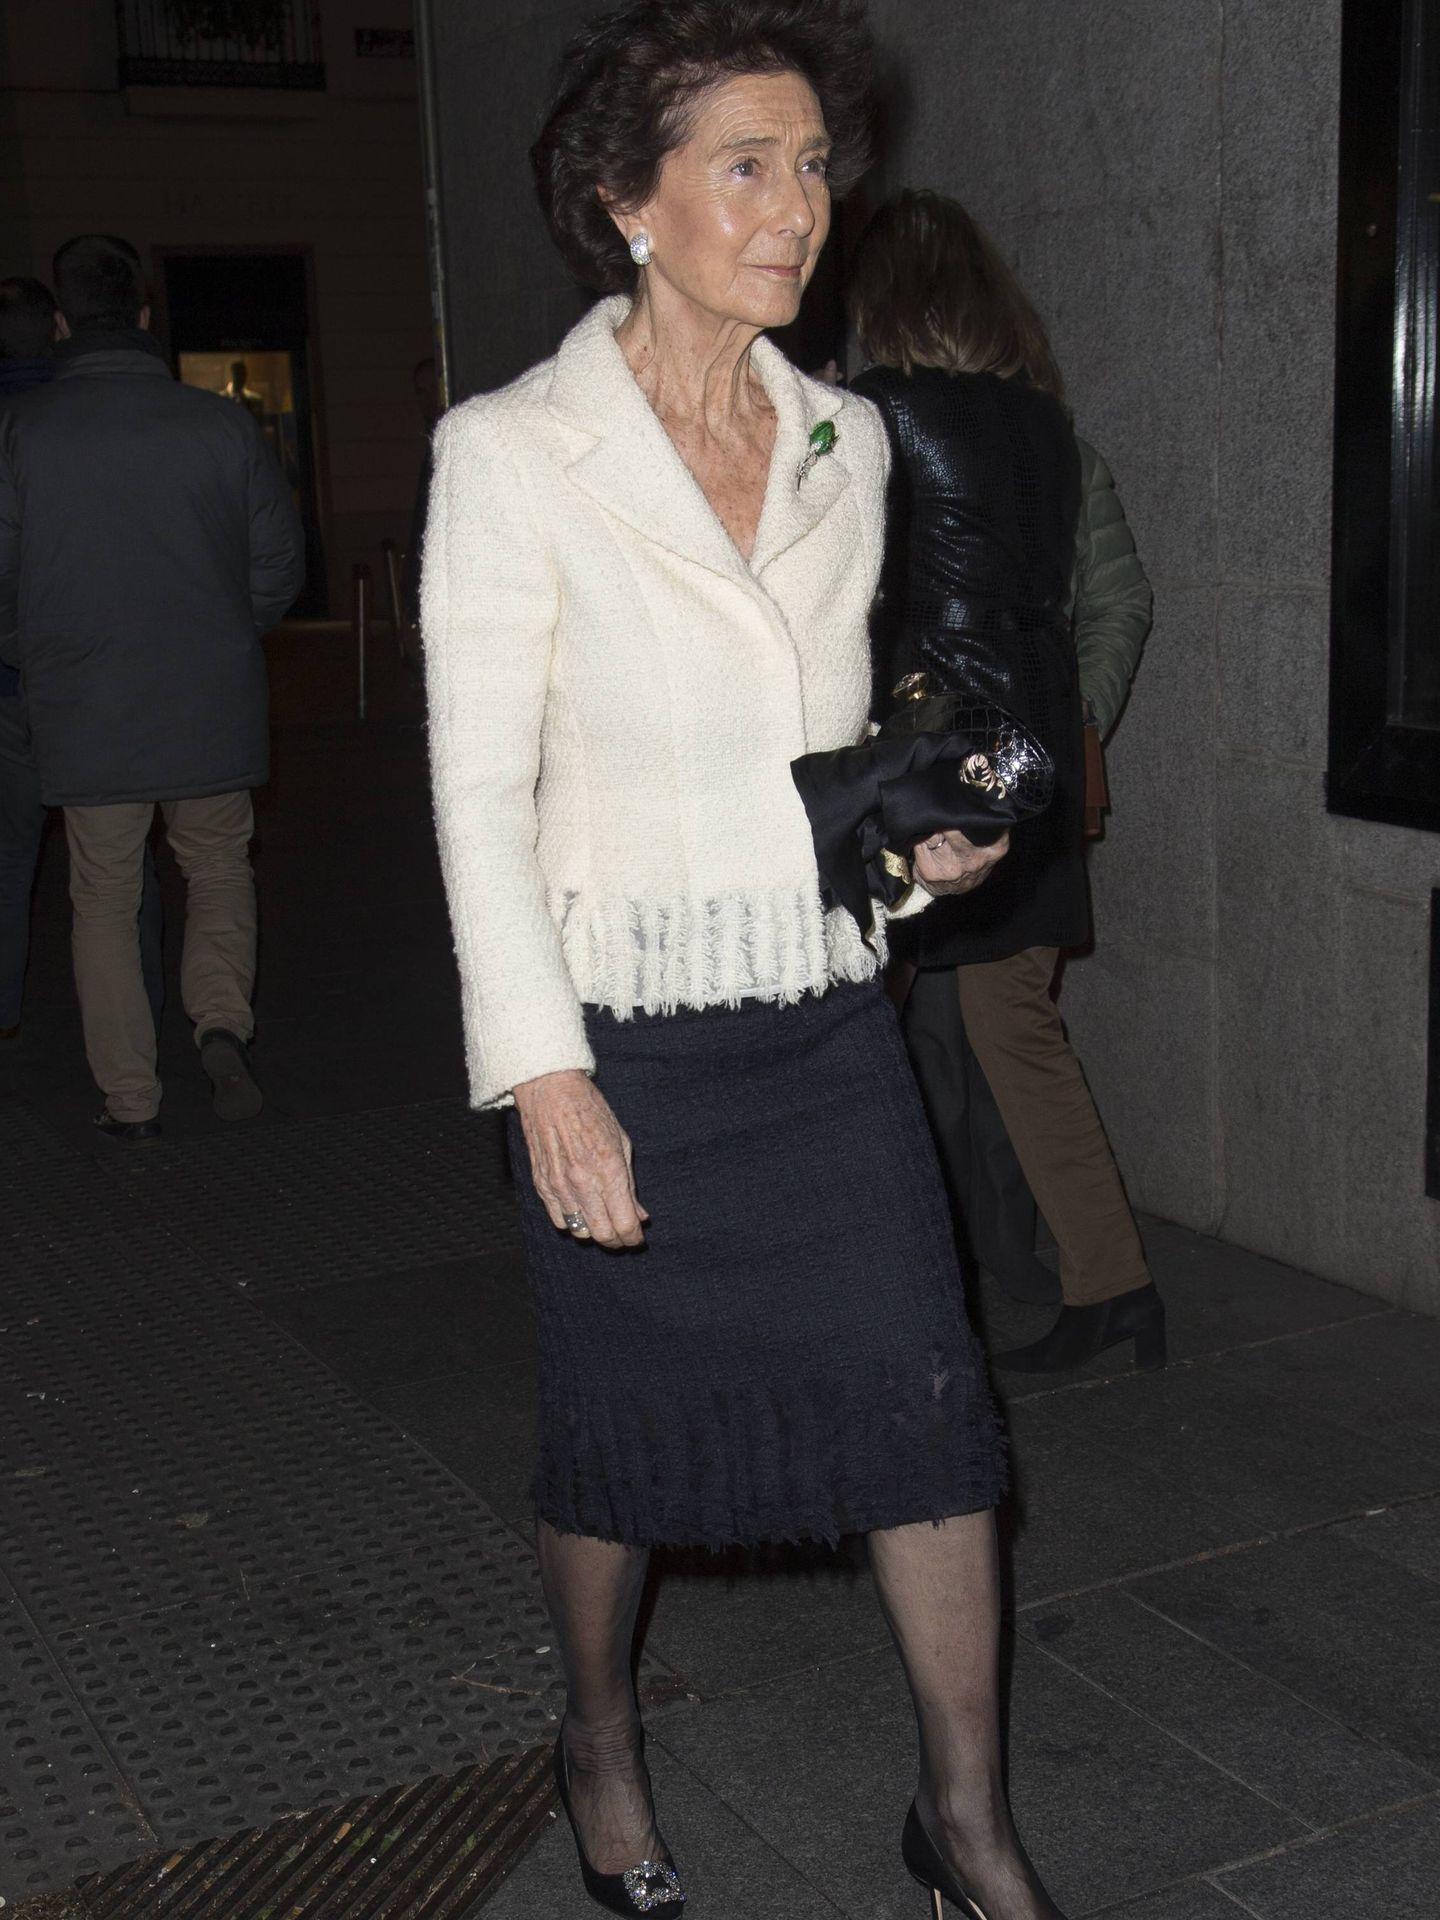 Paloma O'Shea. (J. Martín)